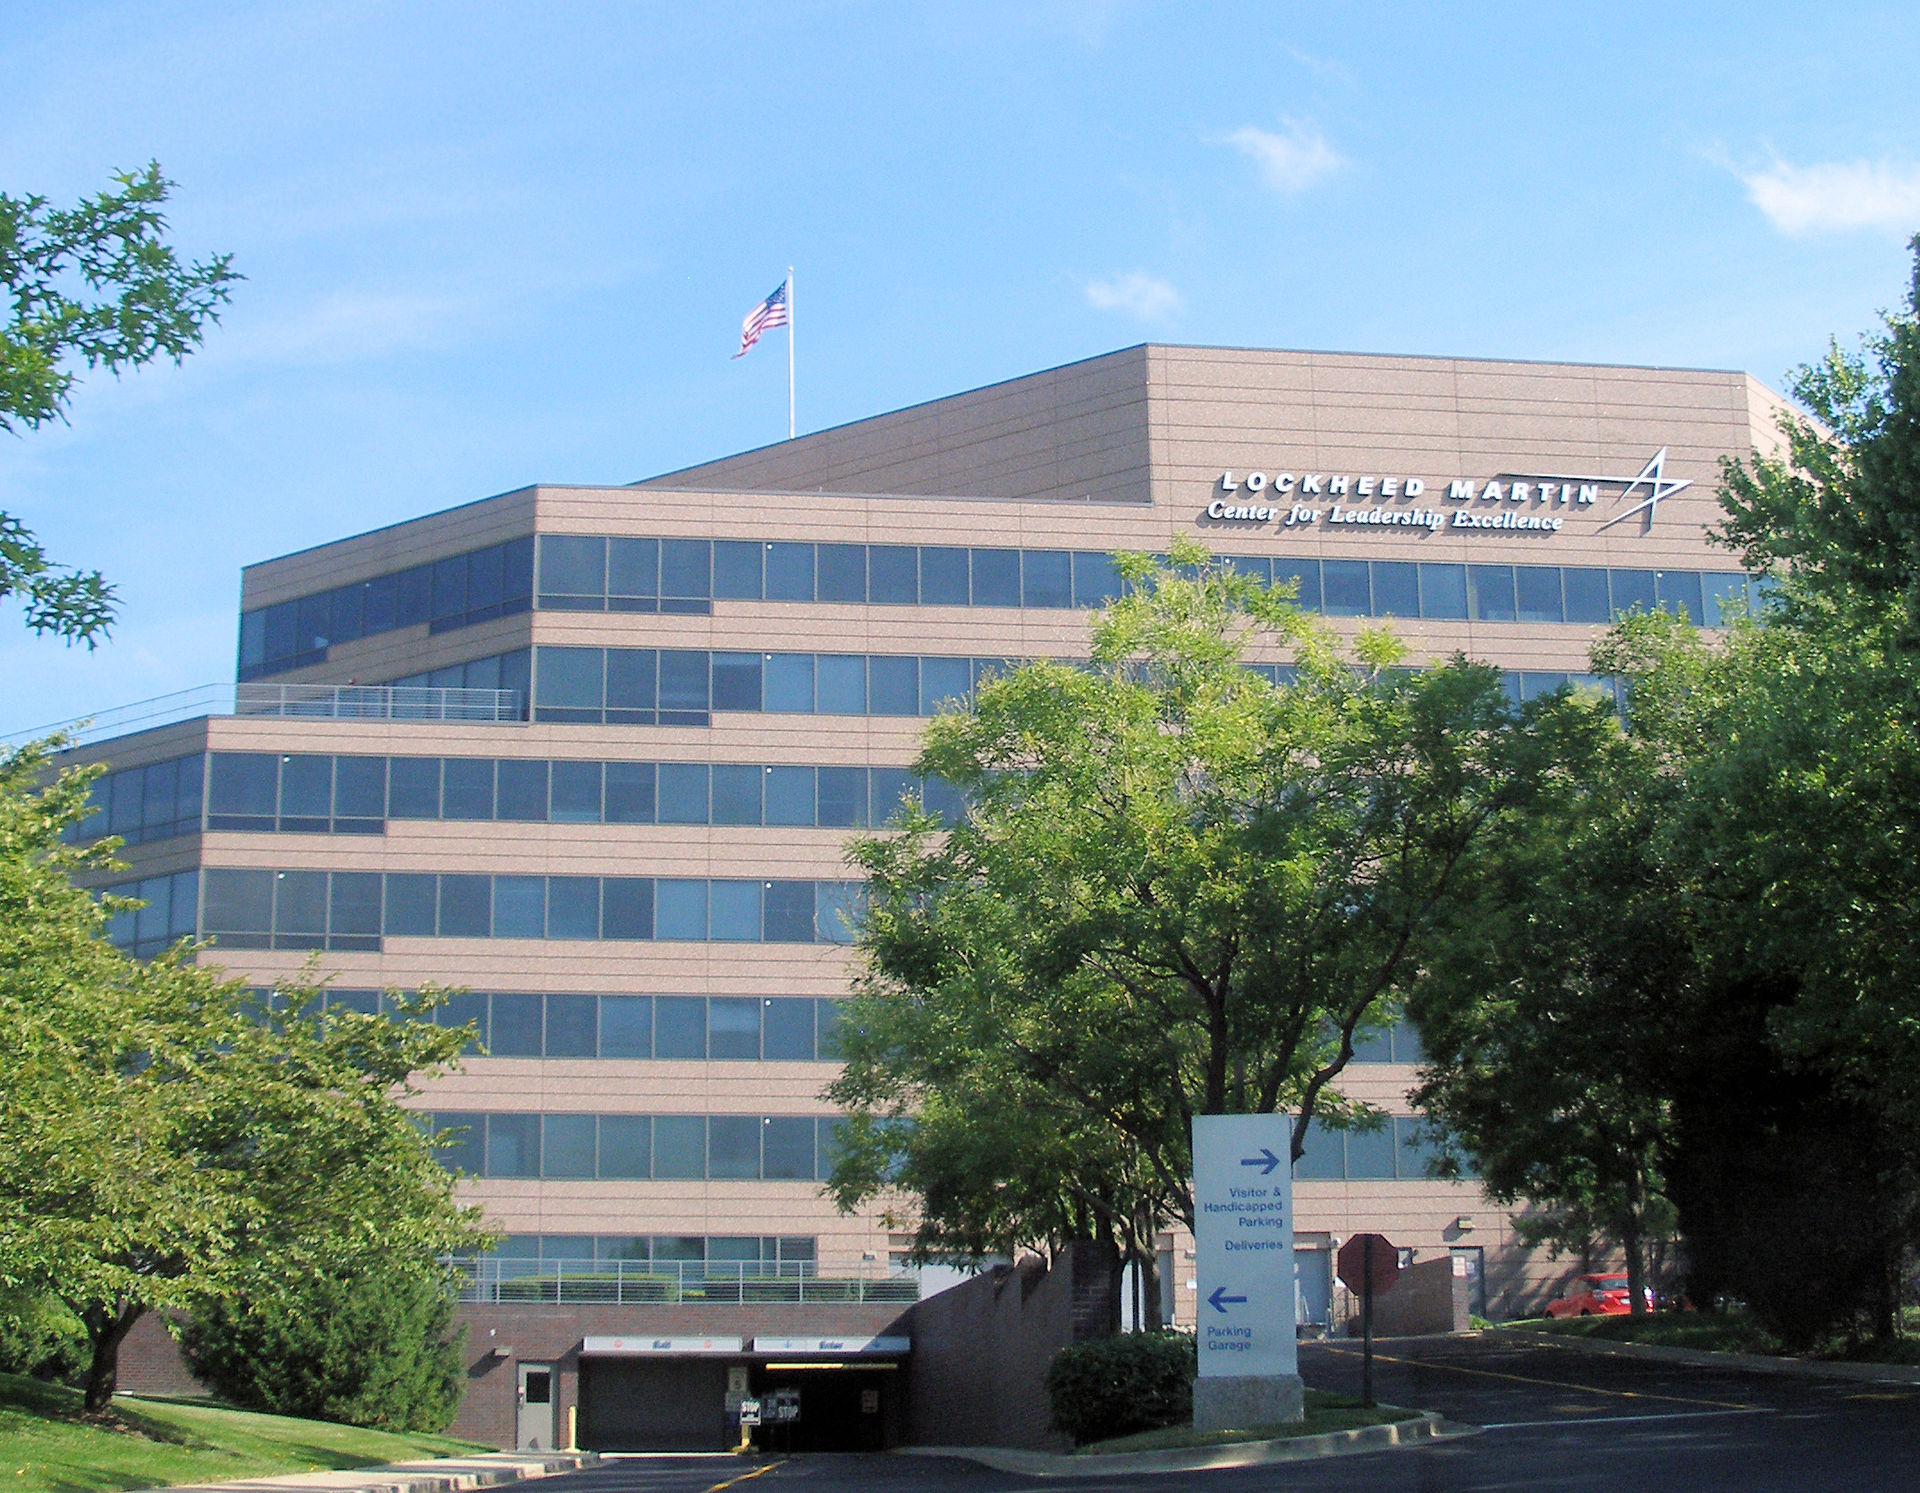 Lockheed Martin Wikipedia